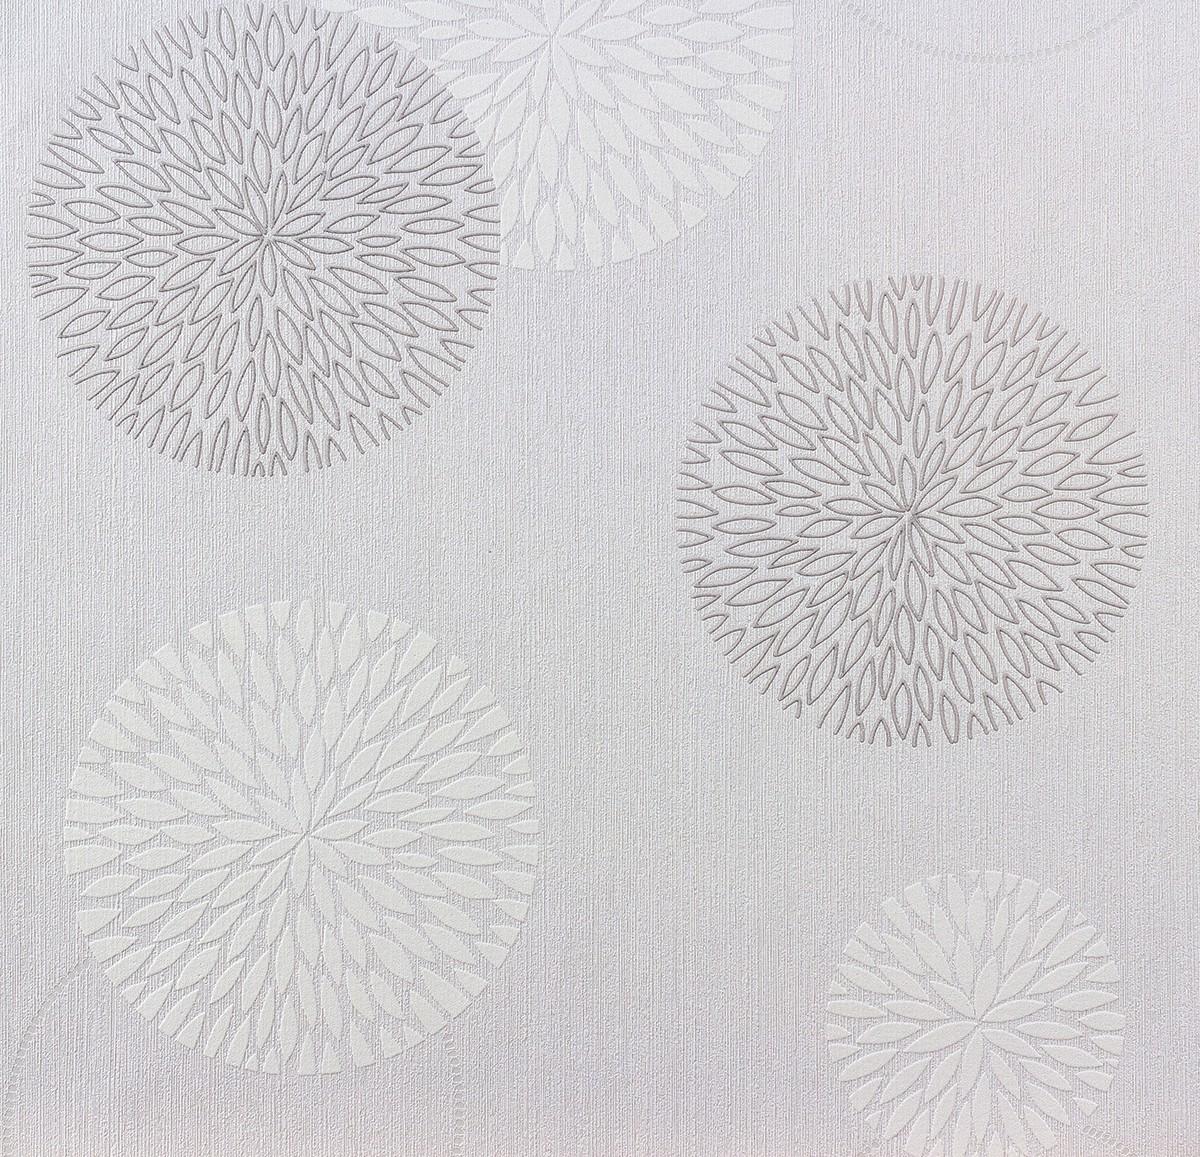 tapete blumen as creation spot wei creme 93792 2. Black Bedroom Furniture Sets. Home Design Ideas